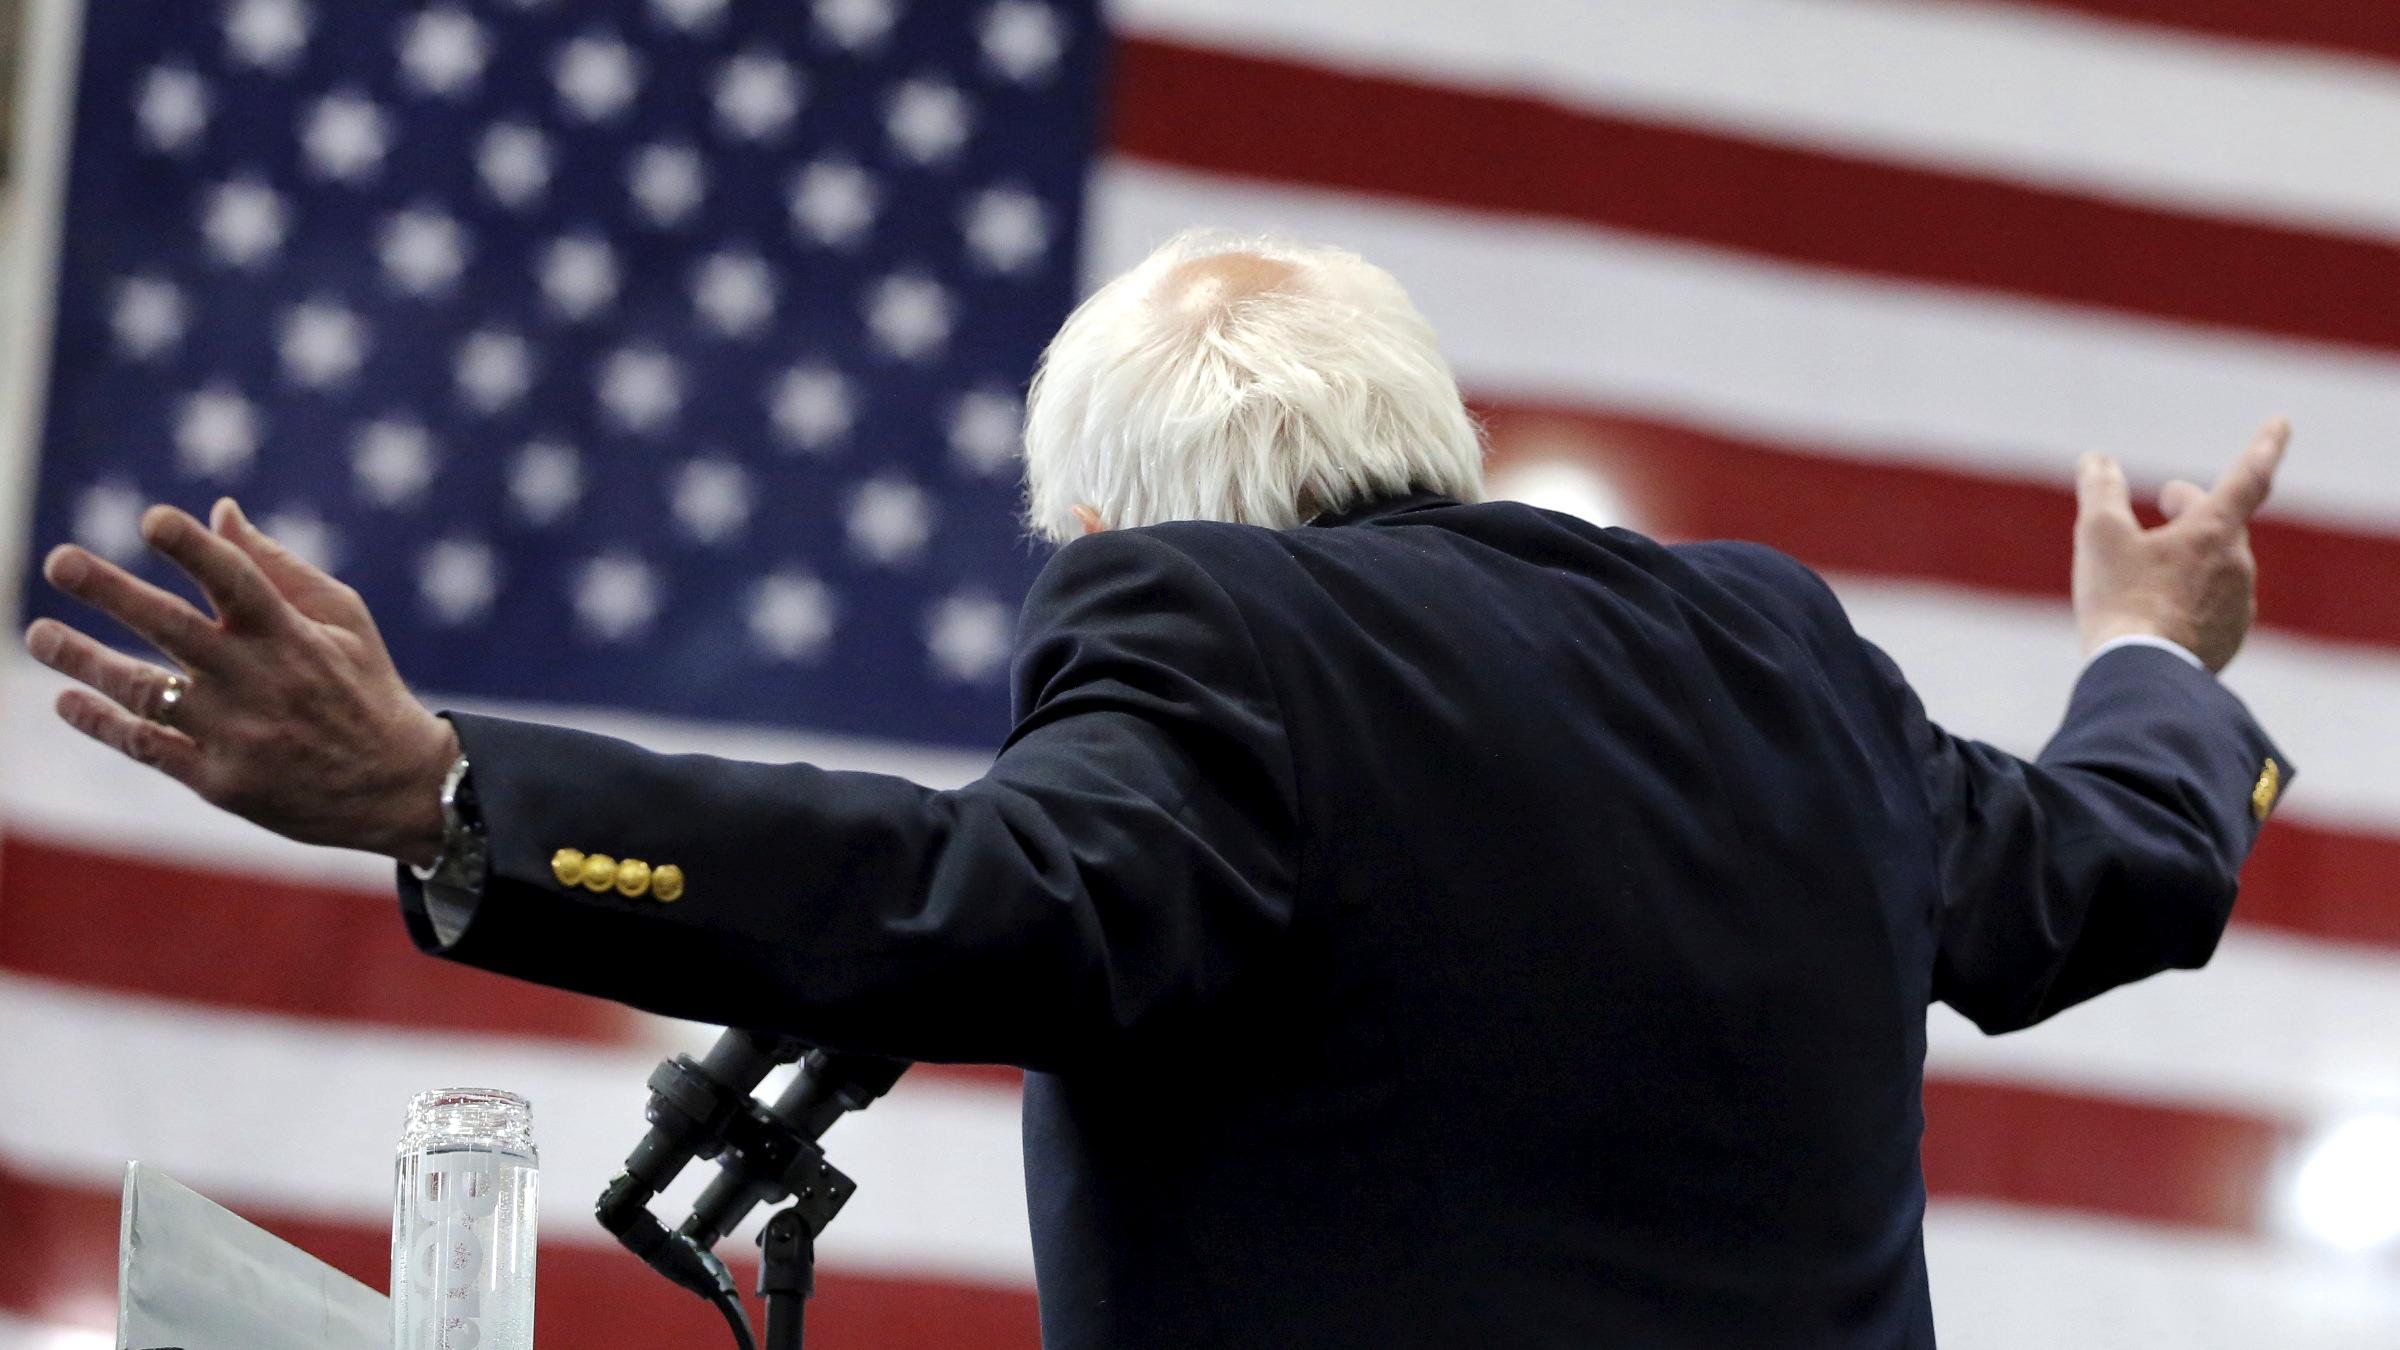 Democratic U.S. presidential candidate Bernie Sanders speaks during an election rally in Erie, Pennsylvania, U.S., April 19, 2016.